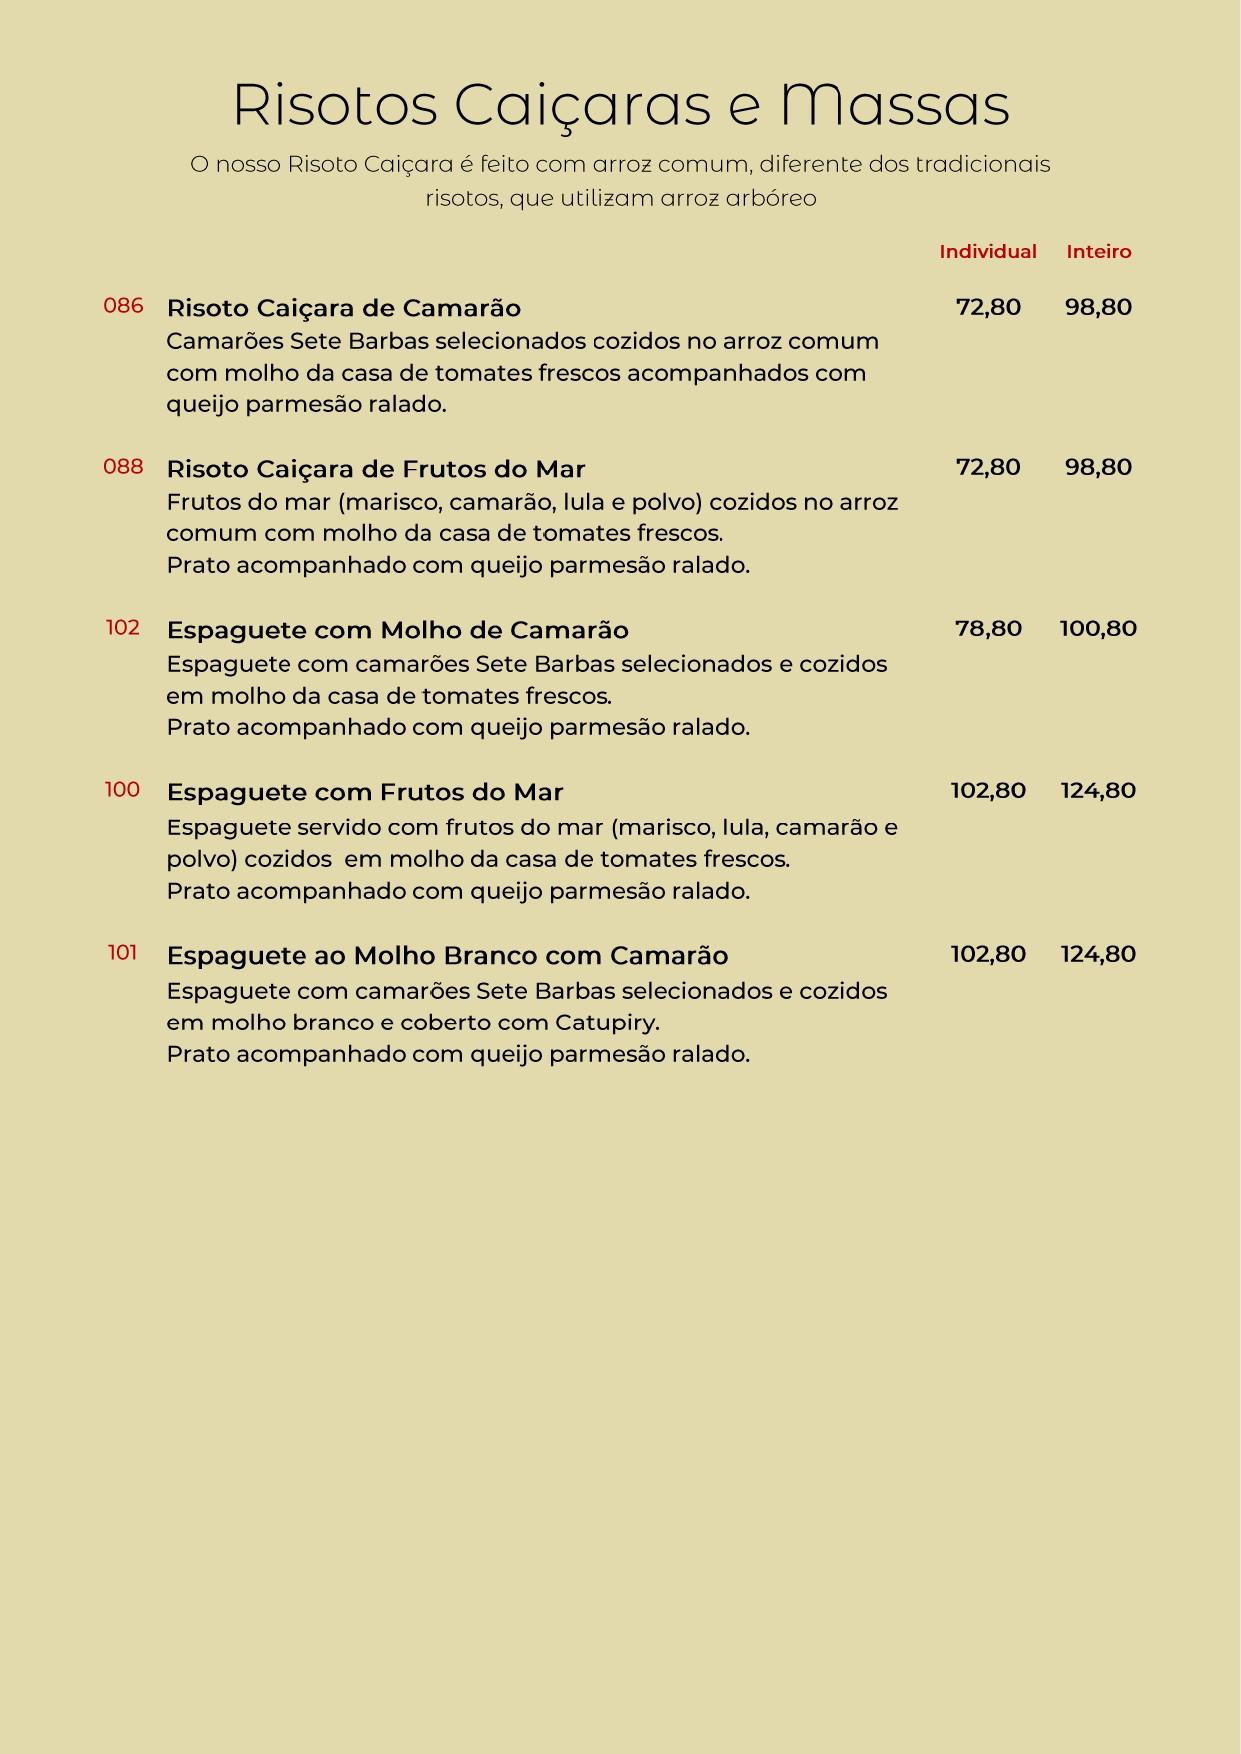 Cardápio Digital_page-0010.jpg